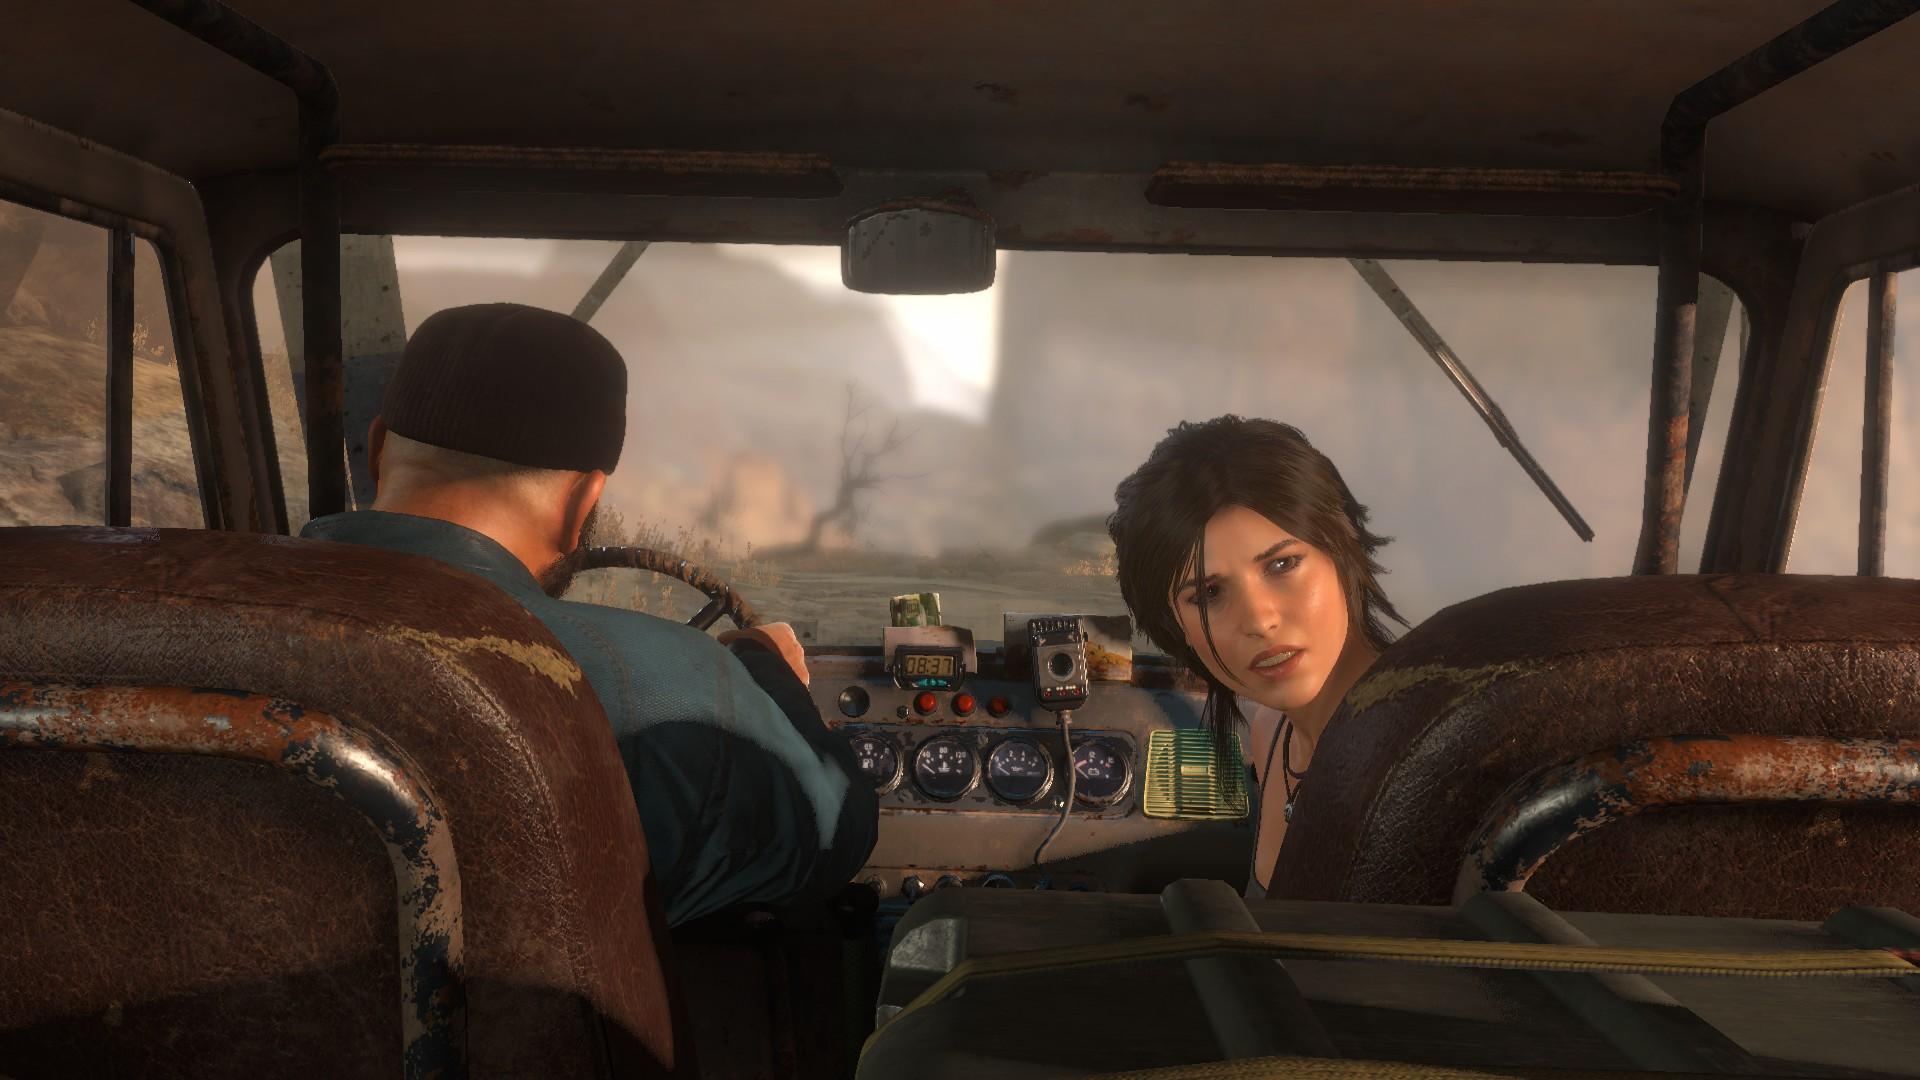 20171203201226_1.jpg - Rise of the Tomb Raider